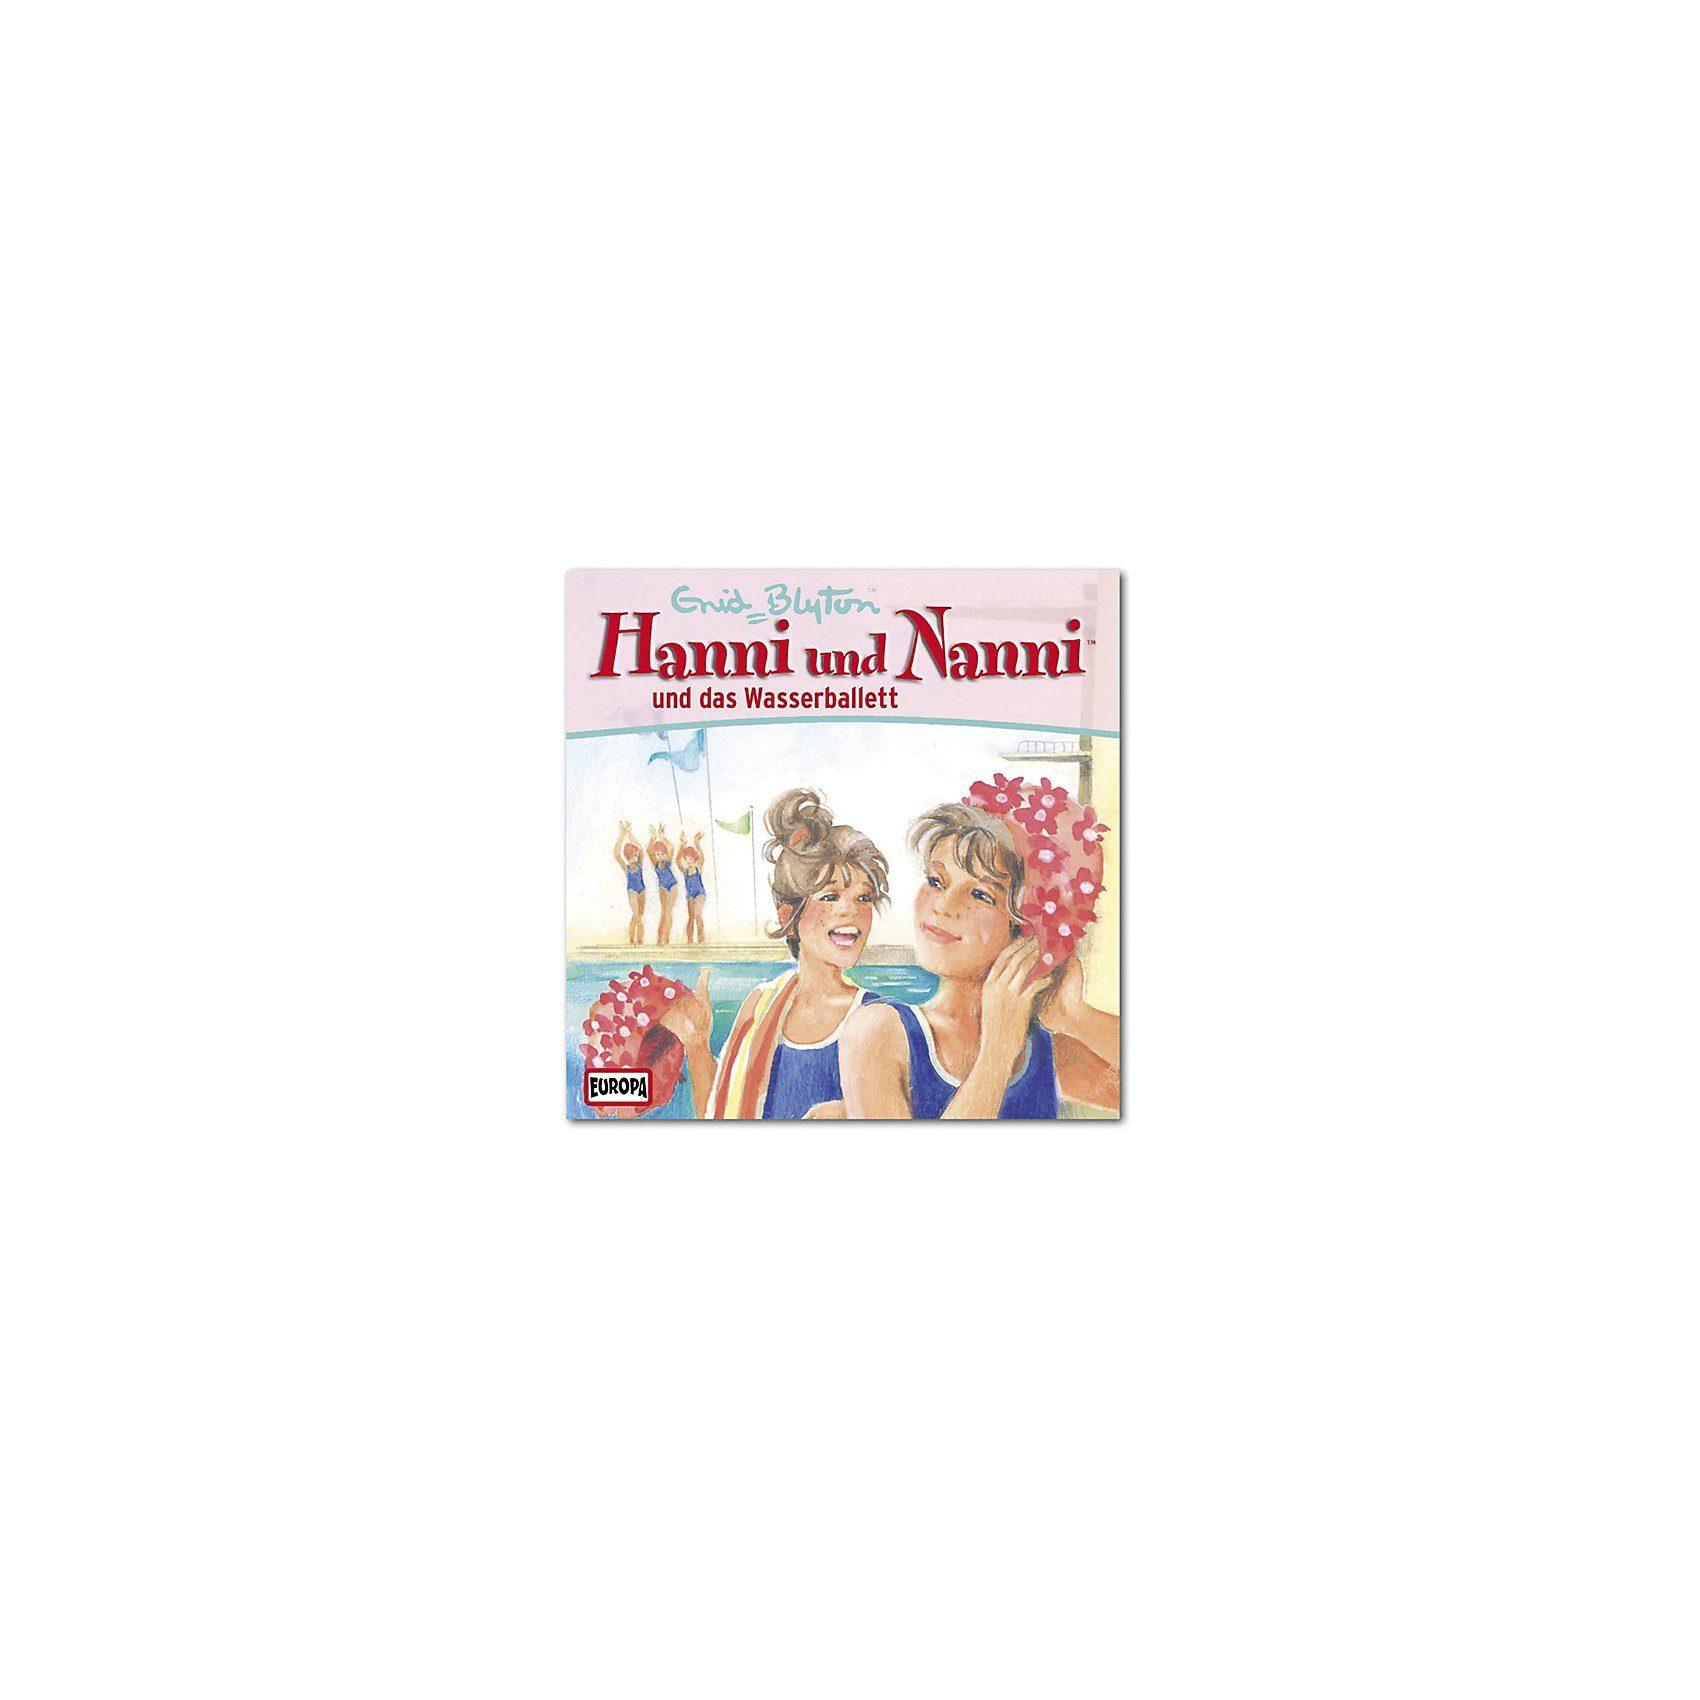 Sony CD Hanni & Nanni 24 - das Wasserballett